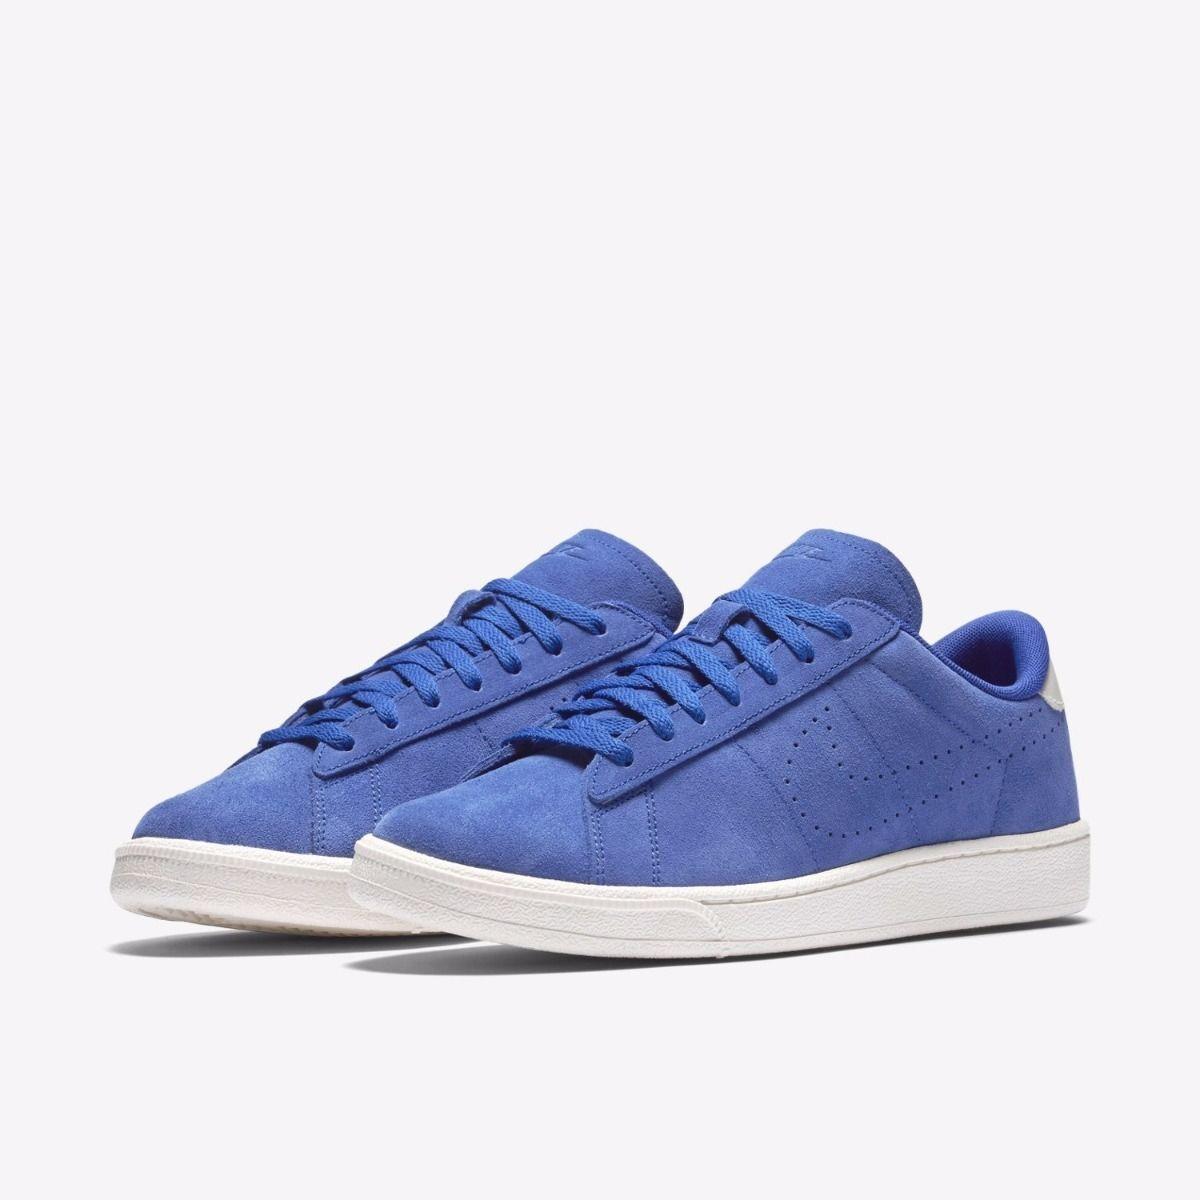 Nuova Uomo Tennis Classic Blue Suede Casual   Nike